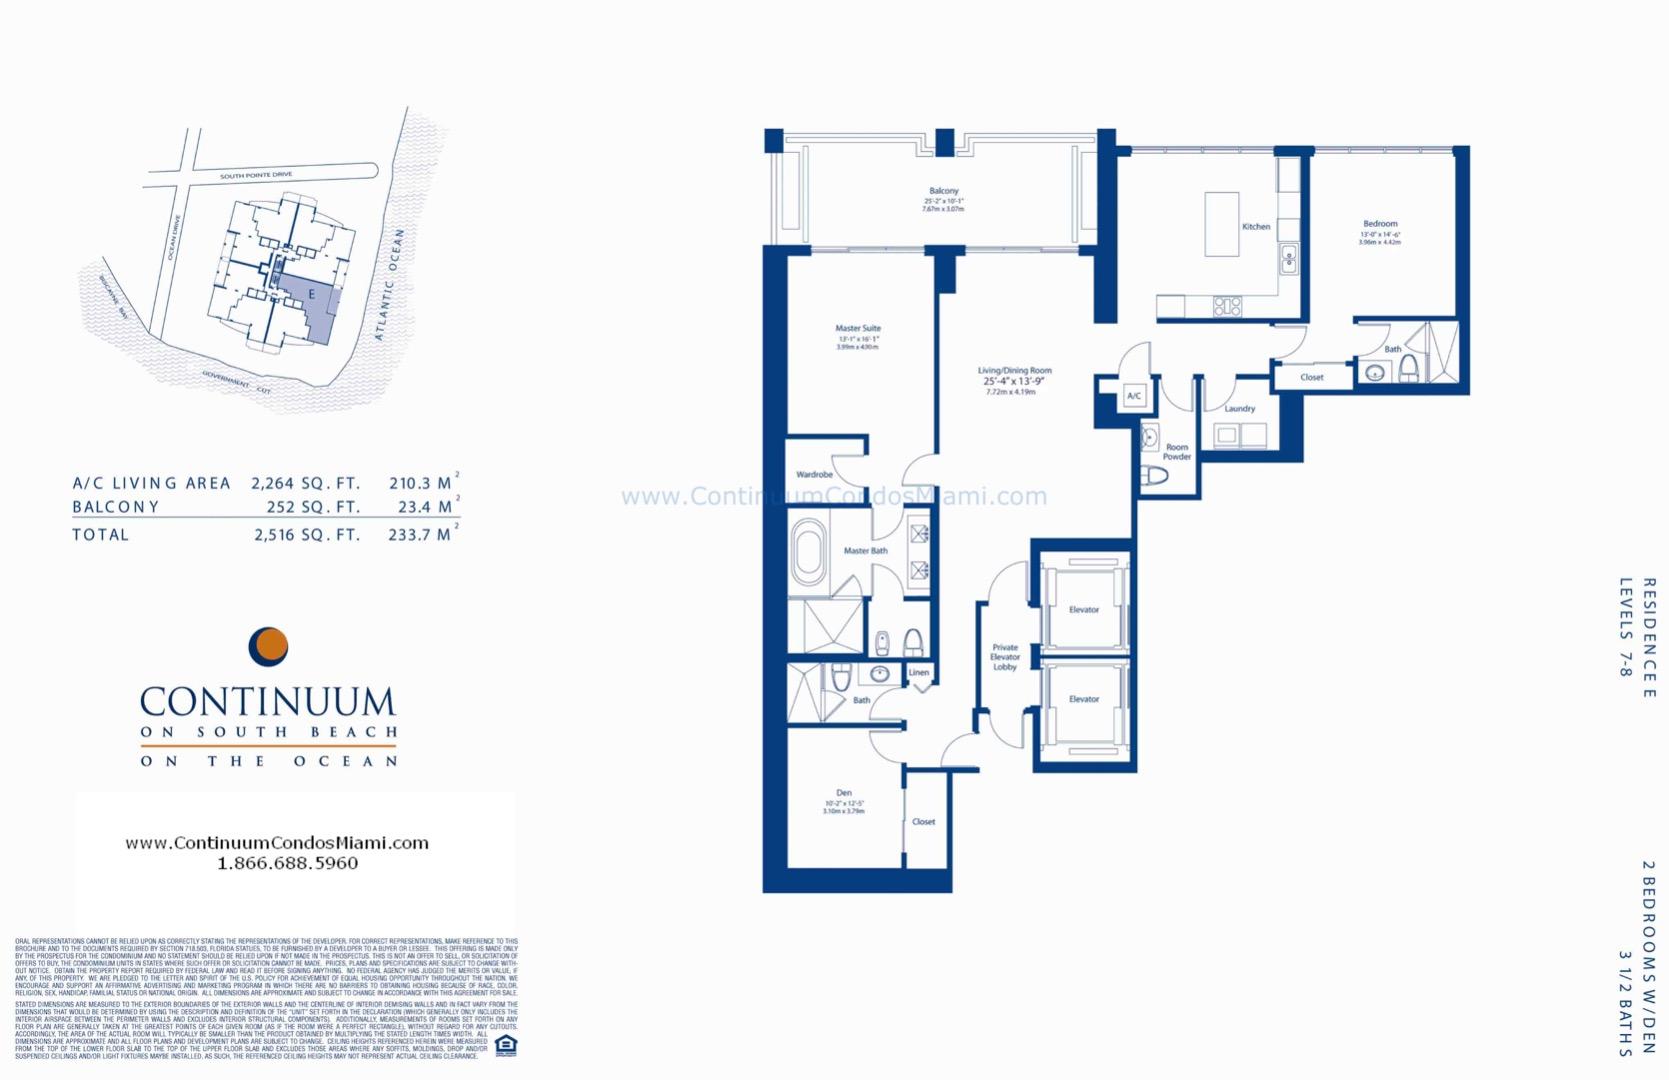 Floor plan image E-MOD - 2/3/1  - 2264 sqft image